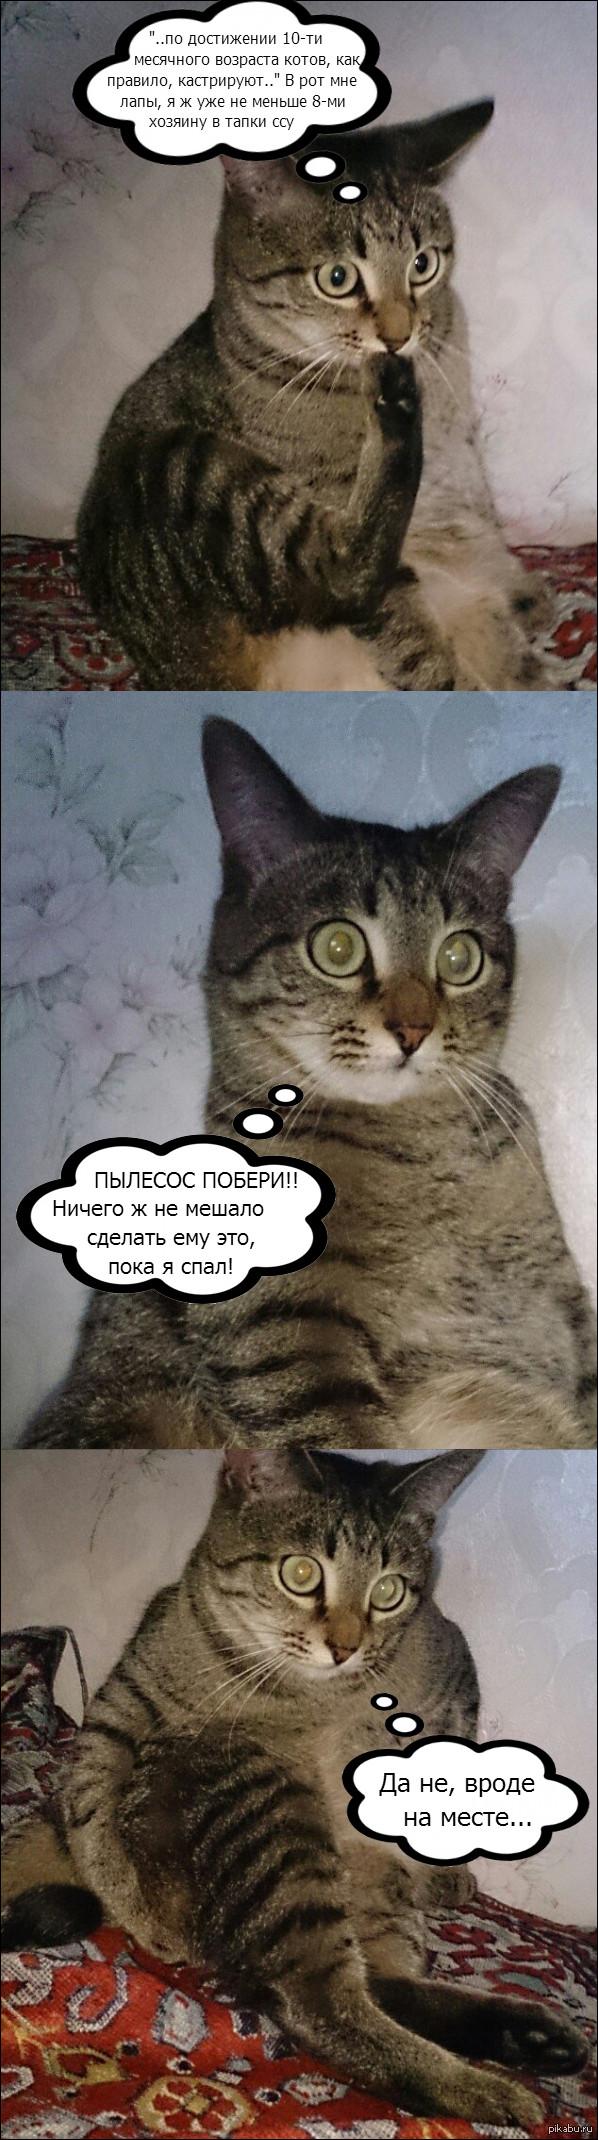 "Неспокойные думы по мотивам <a href=""http://pikabu.ru/story/koteyka_zadumalsya__2957947"">http://pikabu.ru/story/_2957947</a>"